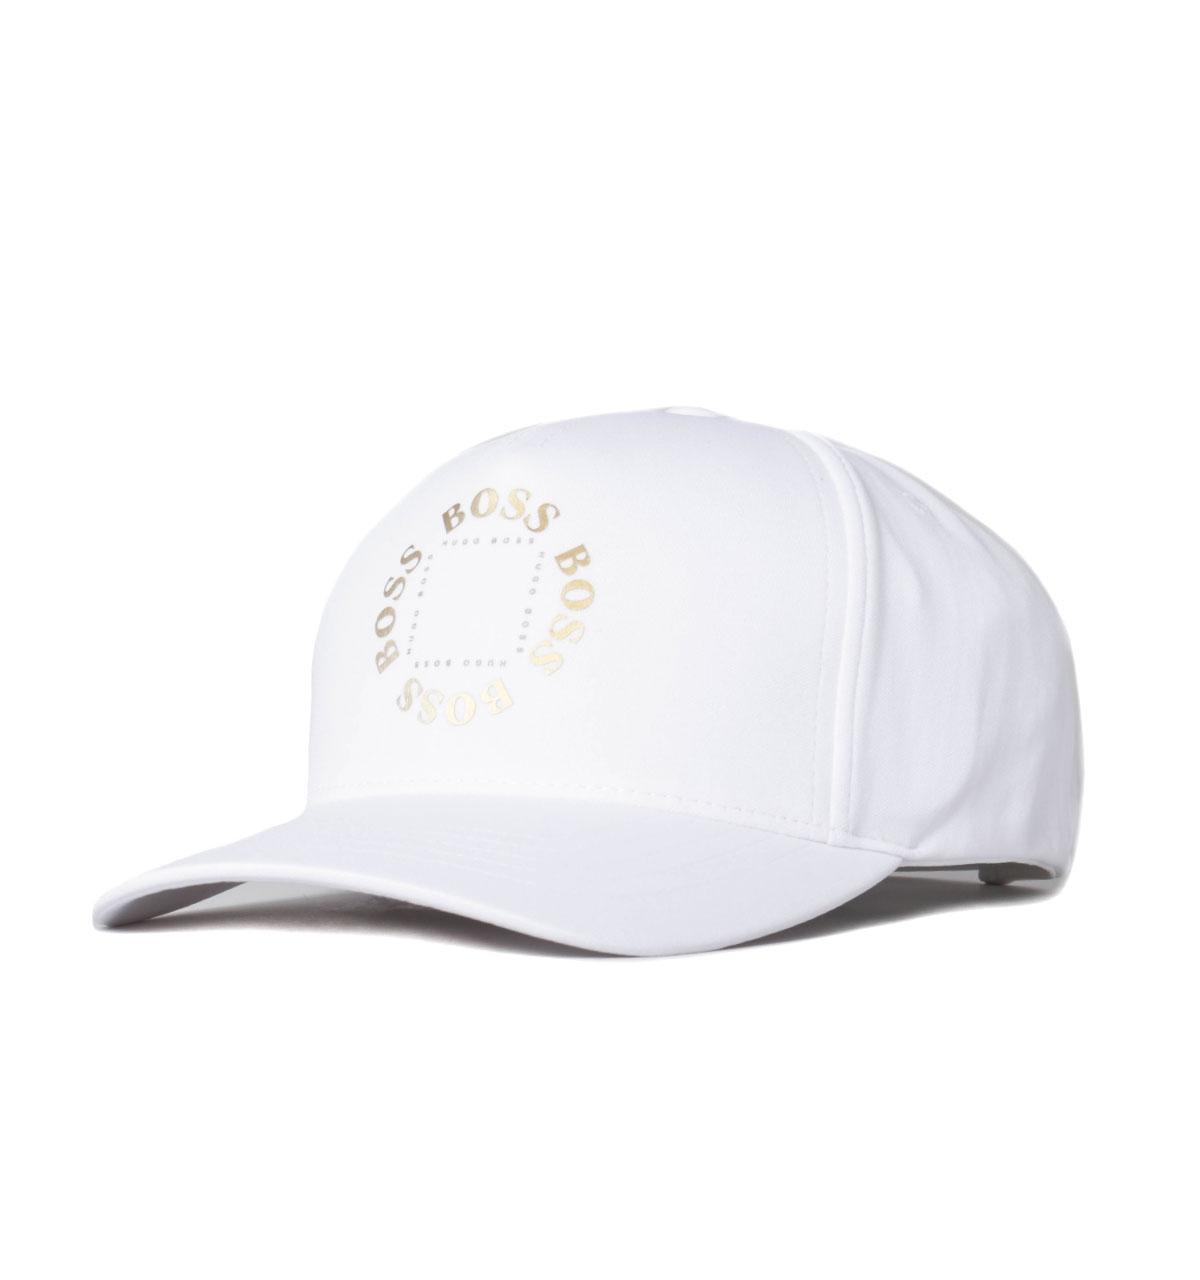 HUGO BOSS WHITE CIRCLE CAP